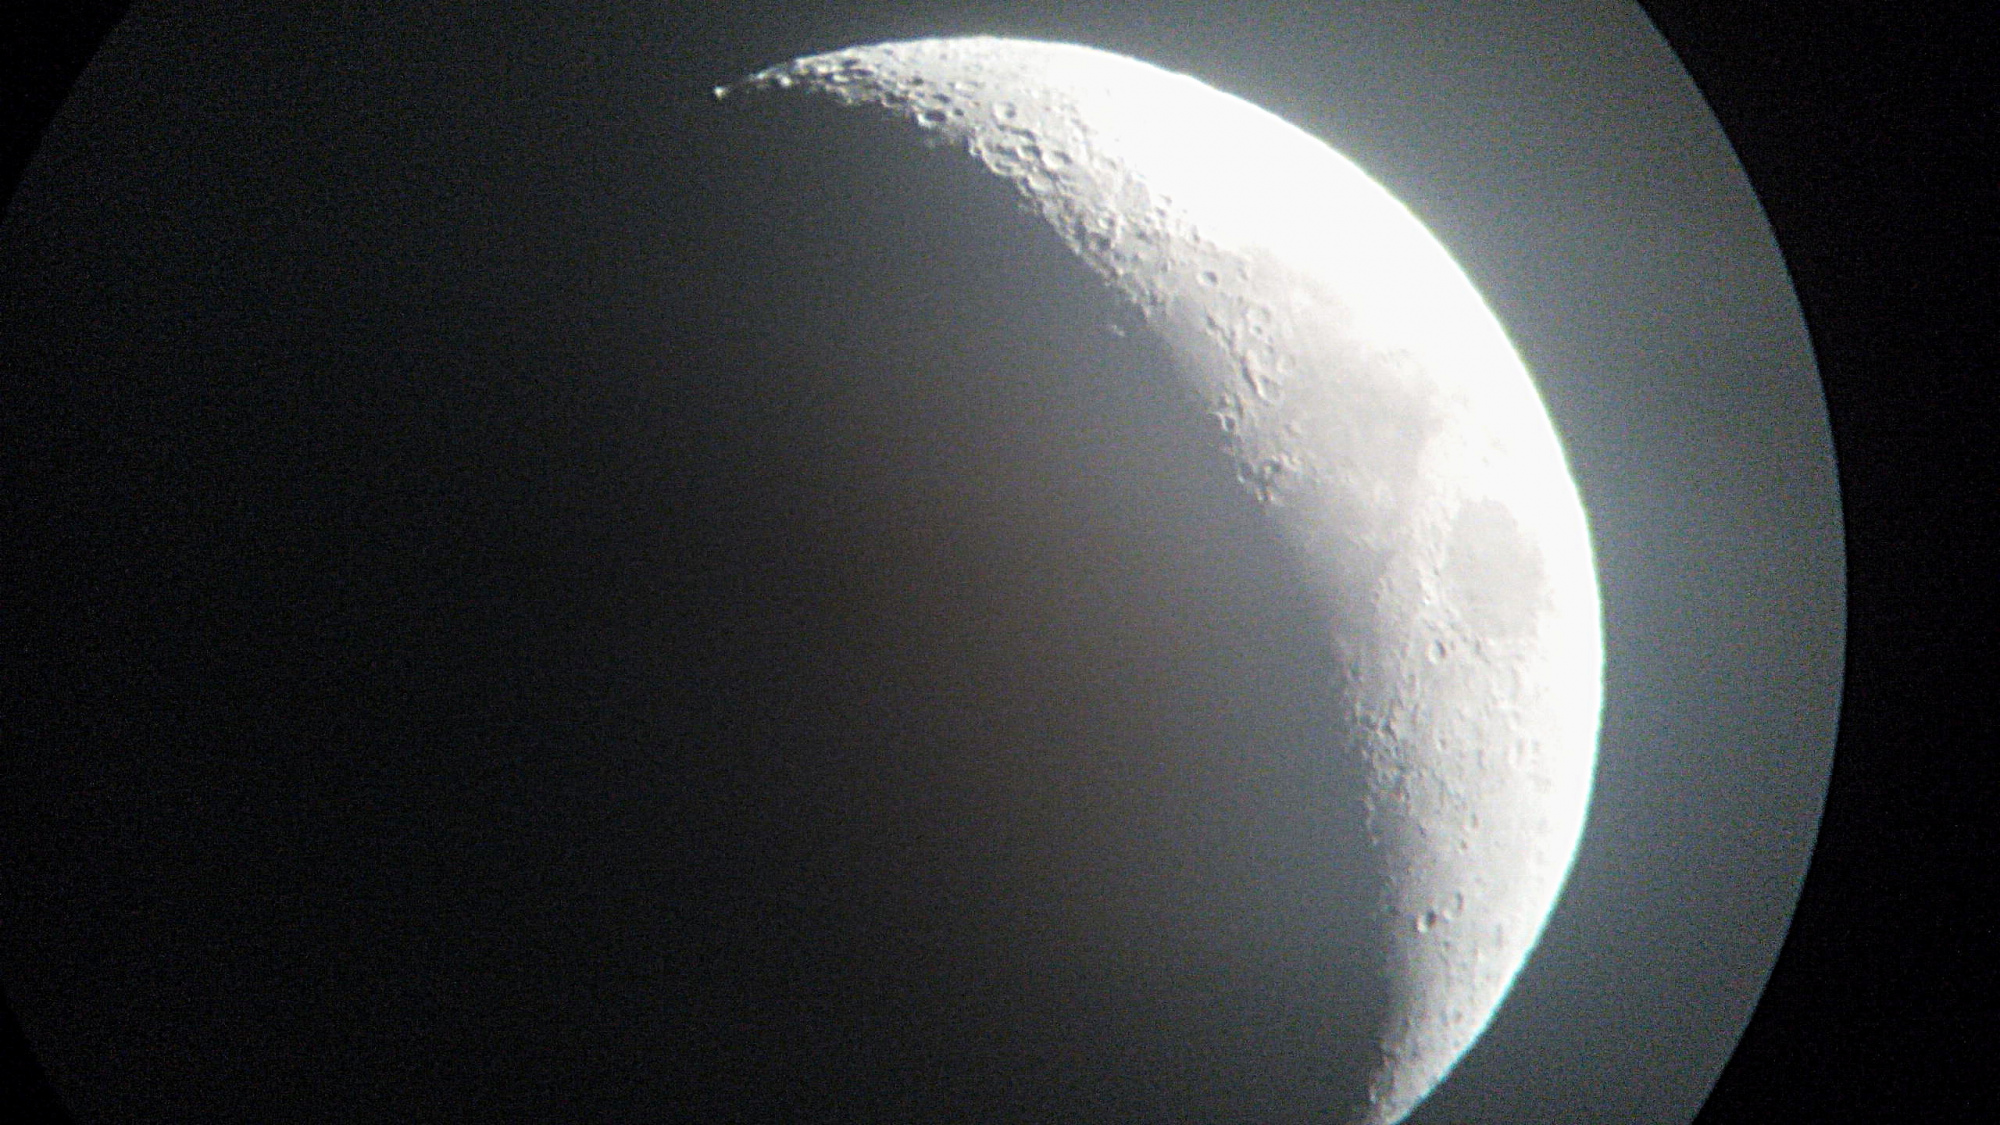 moon_20181112_194645.thumb.jpg.4b4a074dff4e8e8b344da0e241bb9bb9.jpg